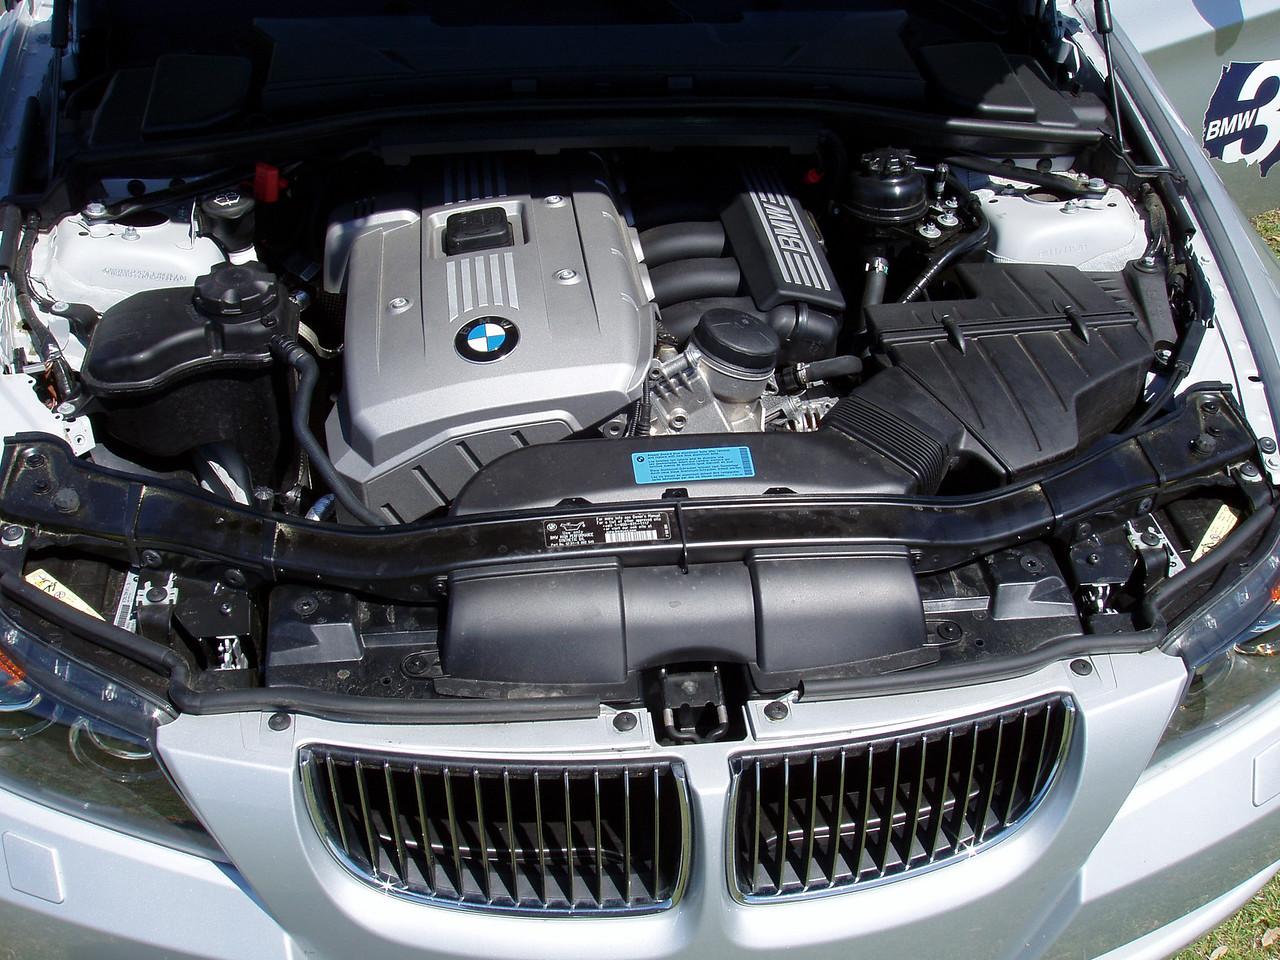 2006 330i Sport Package engine